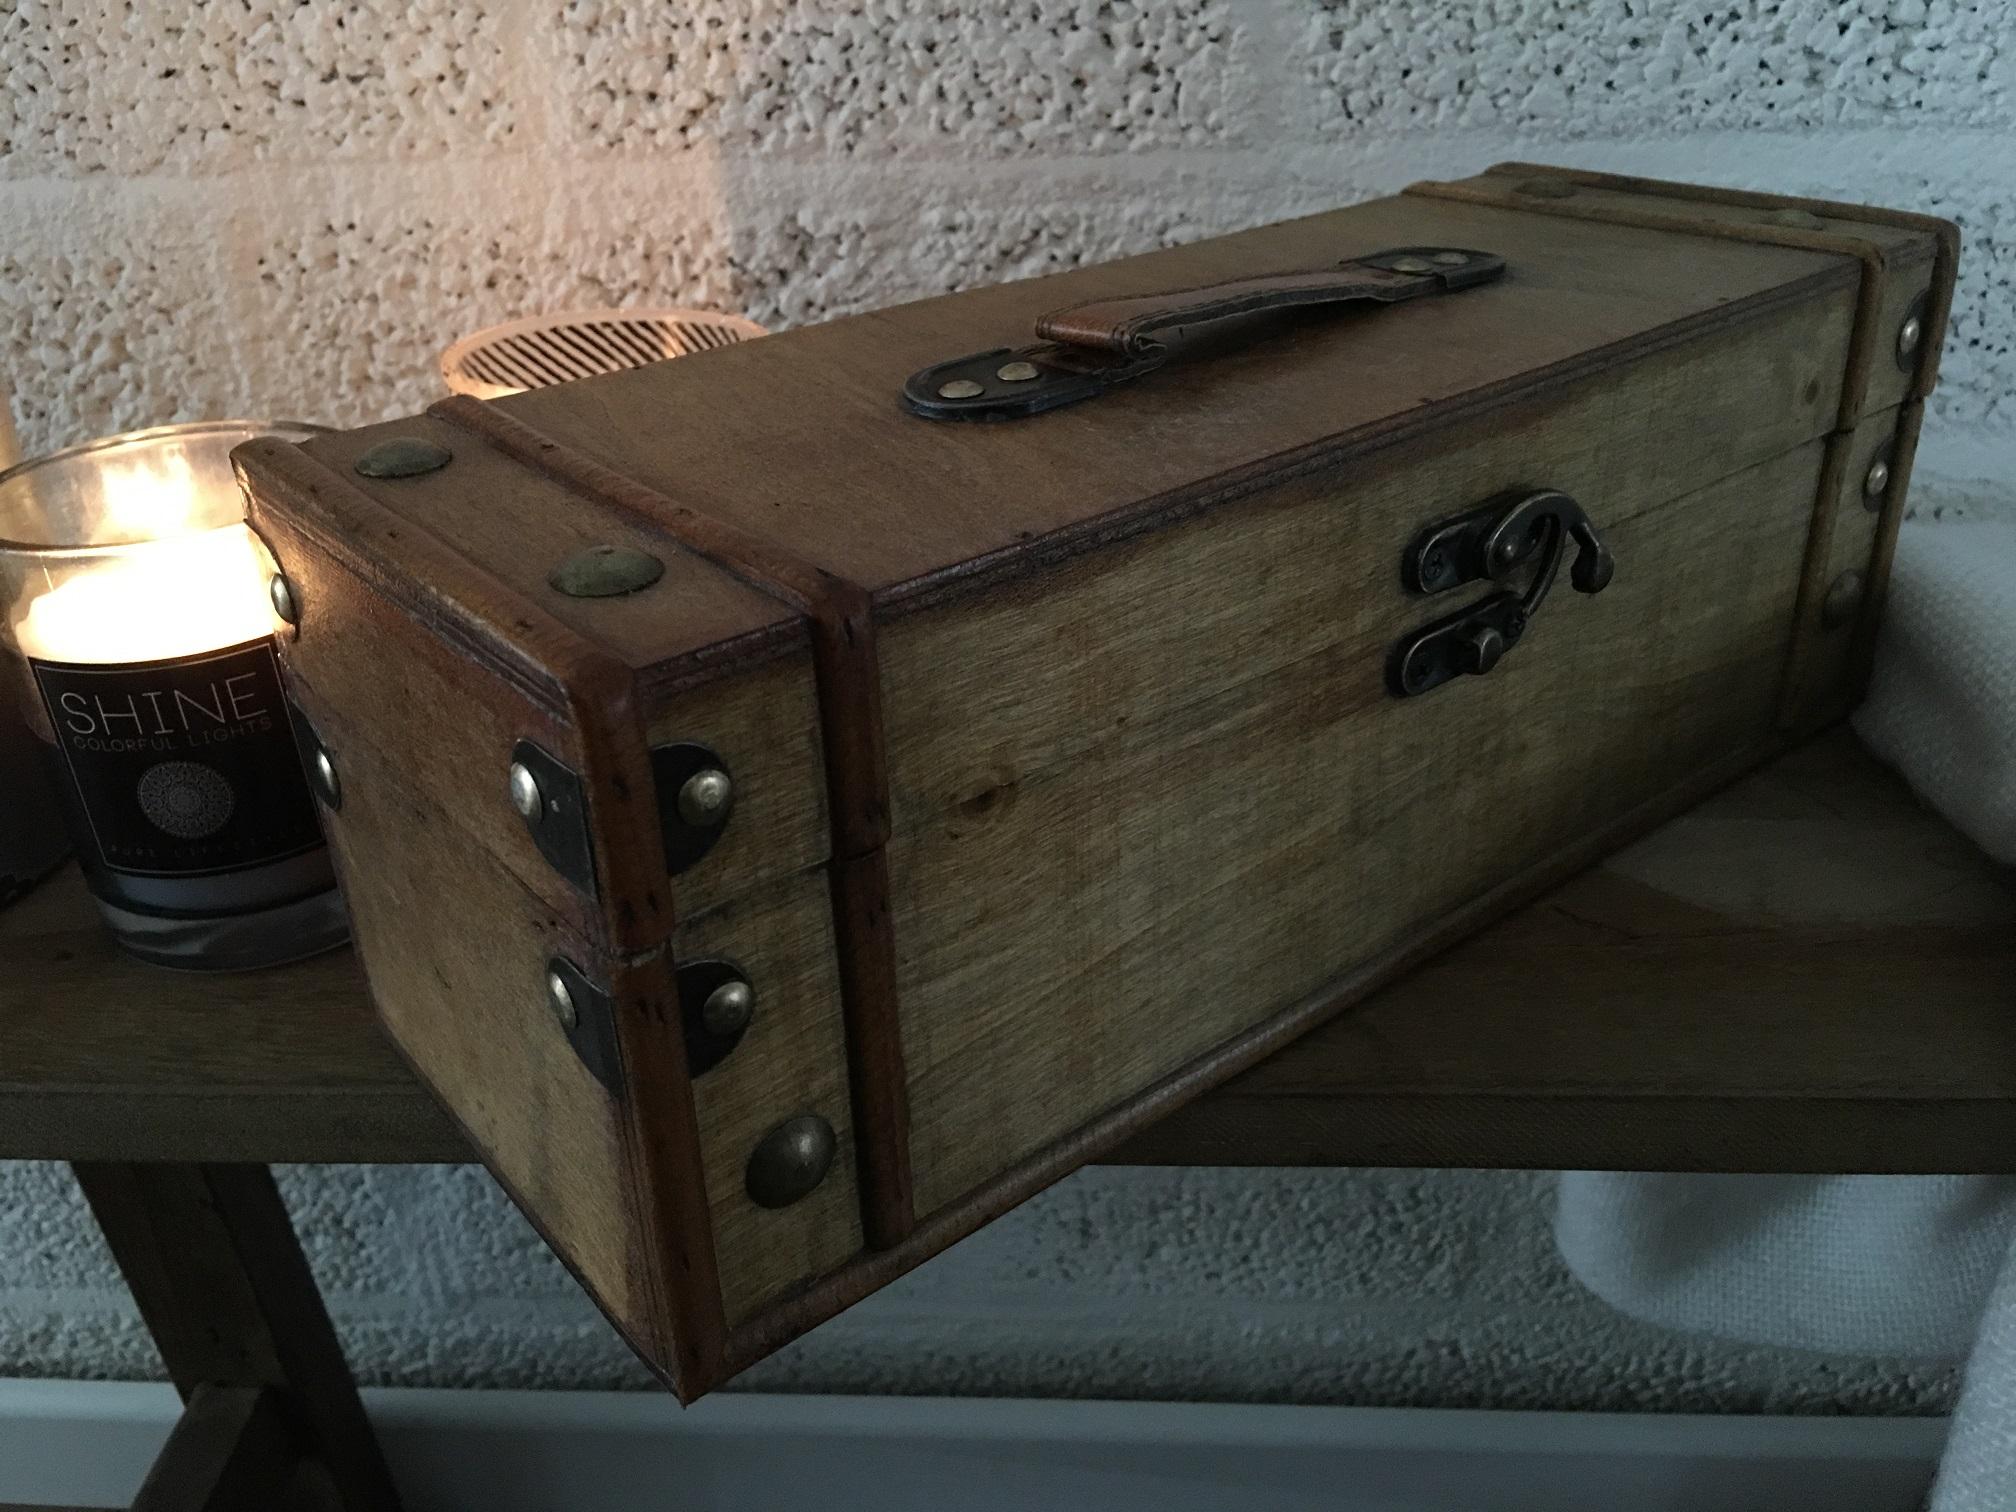 Tags borst houten kist houten kist opslag schatkist houten doos houten doos borst for Deco houten huis